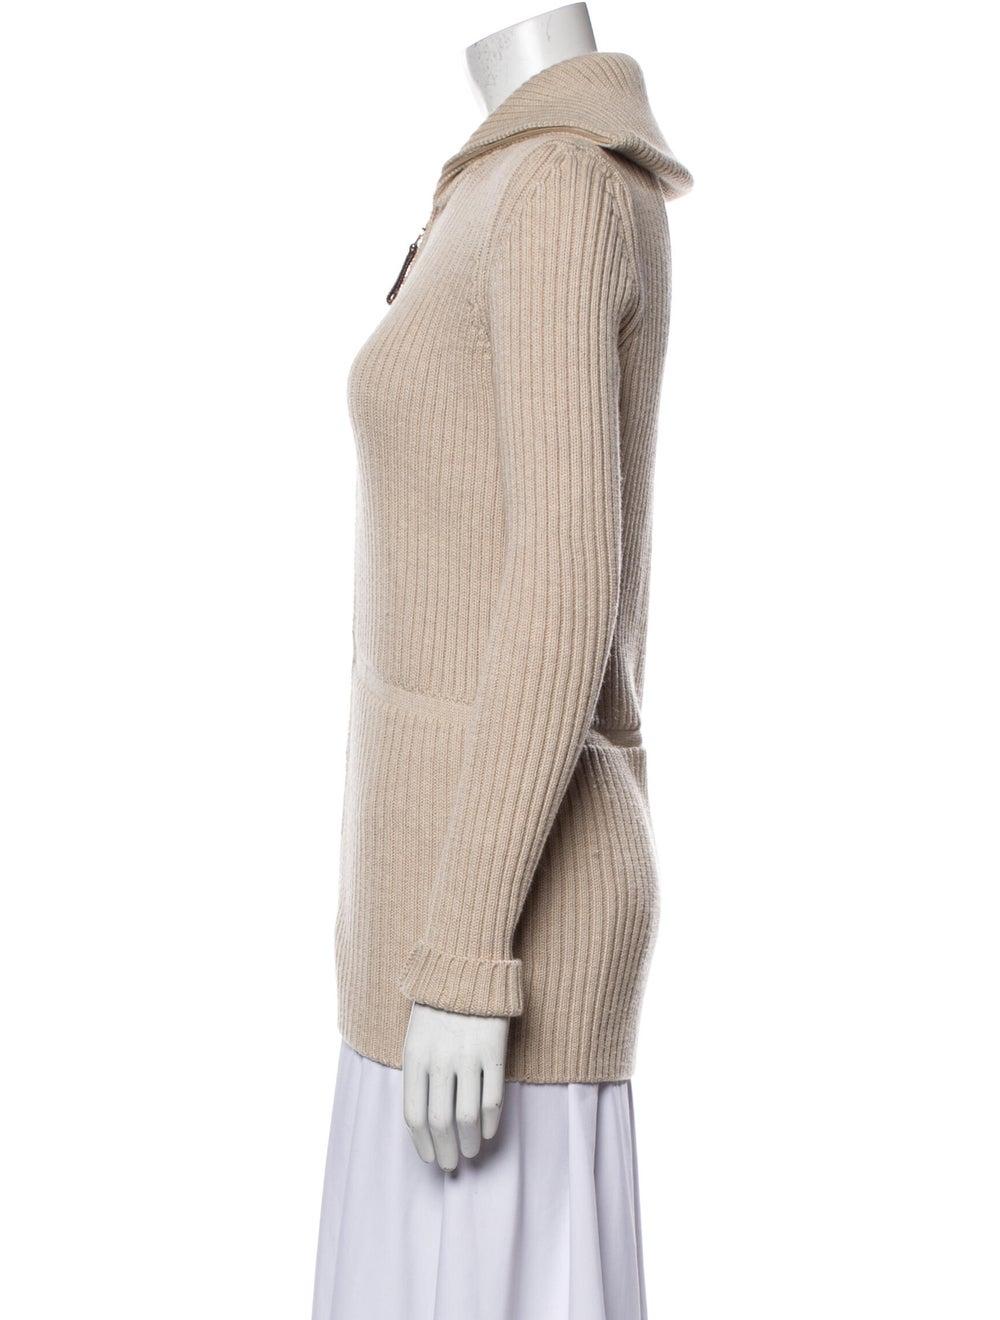 Prada Wool Sweater Wool - image 2